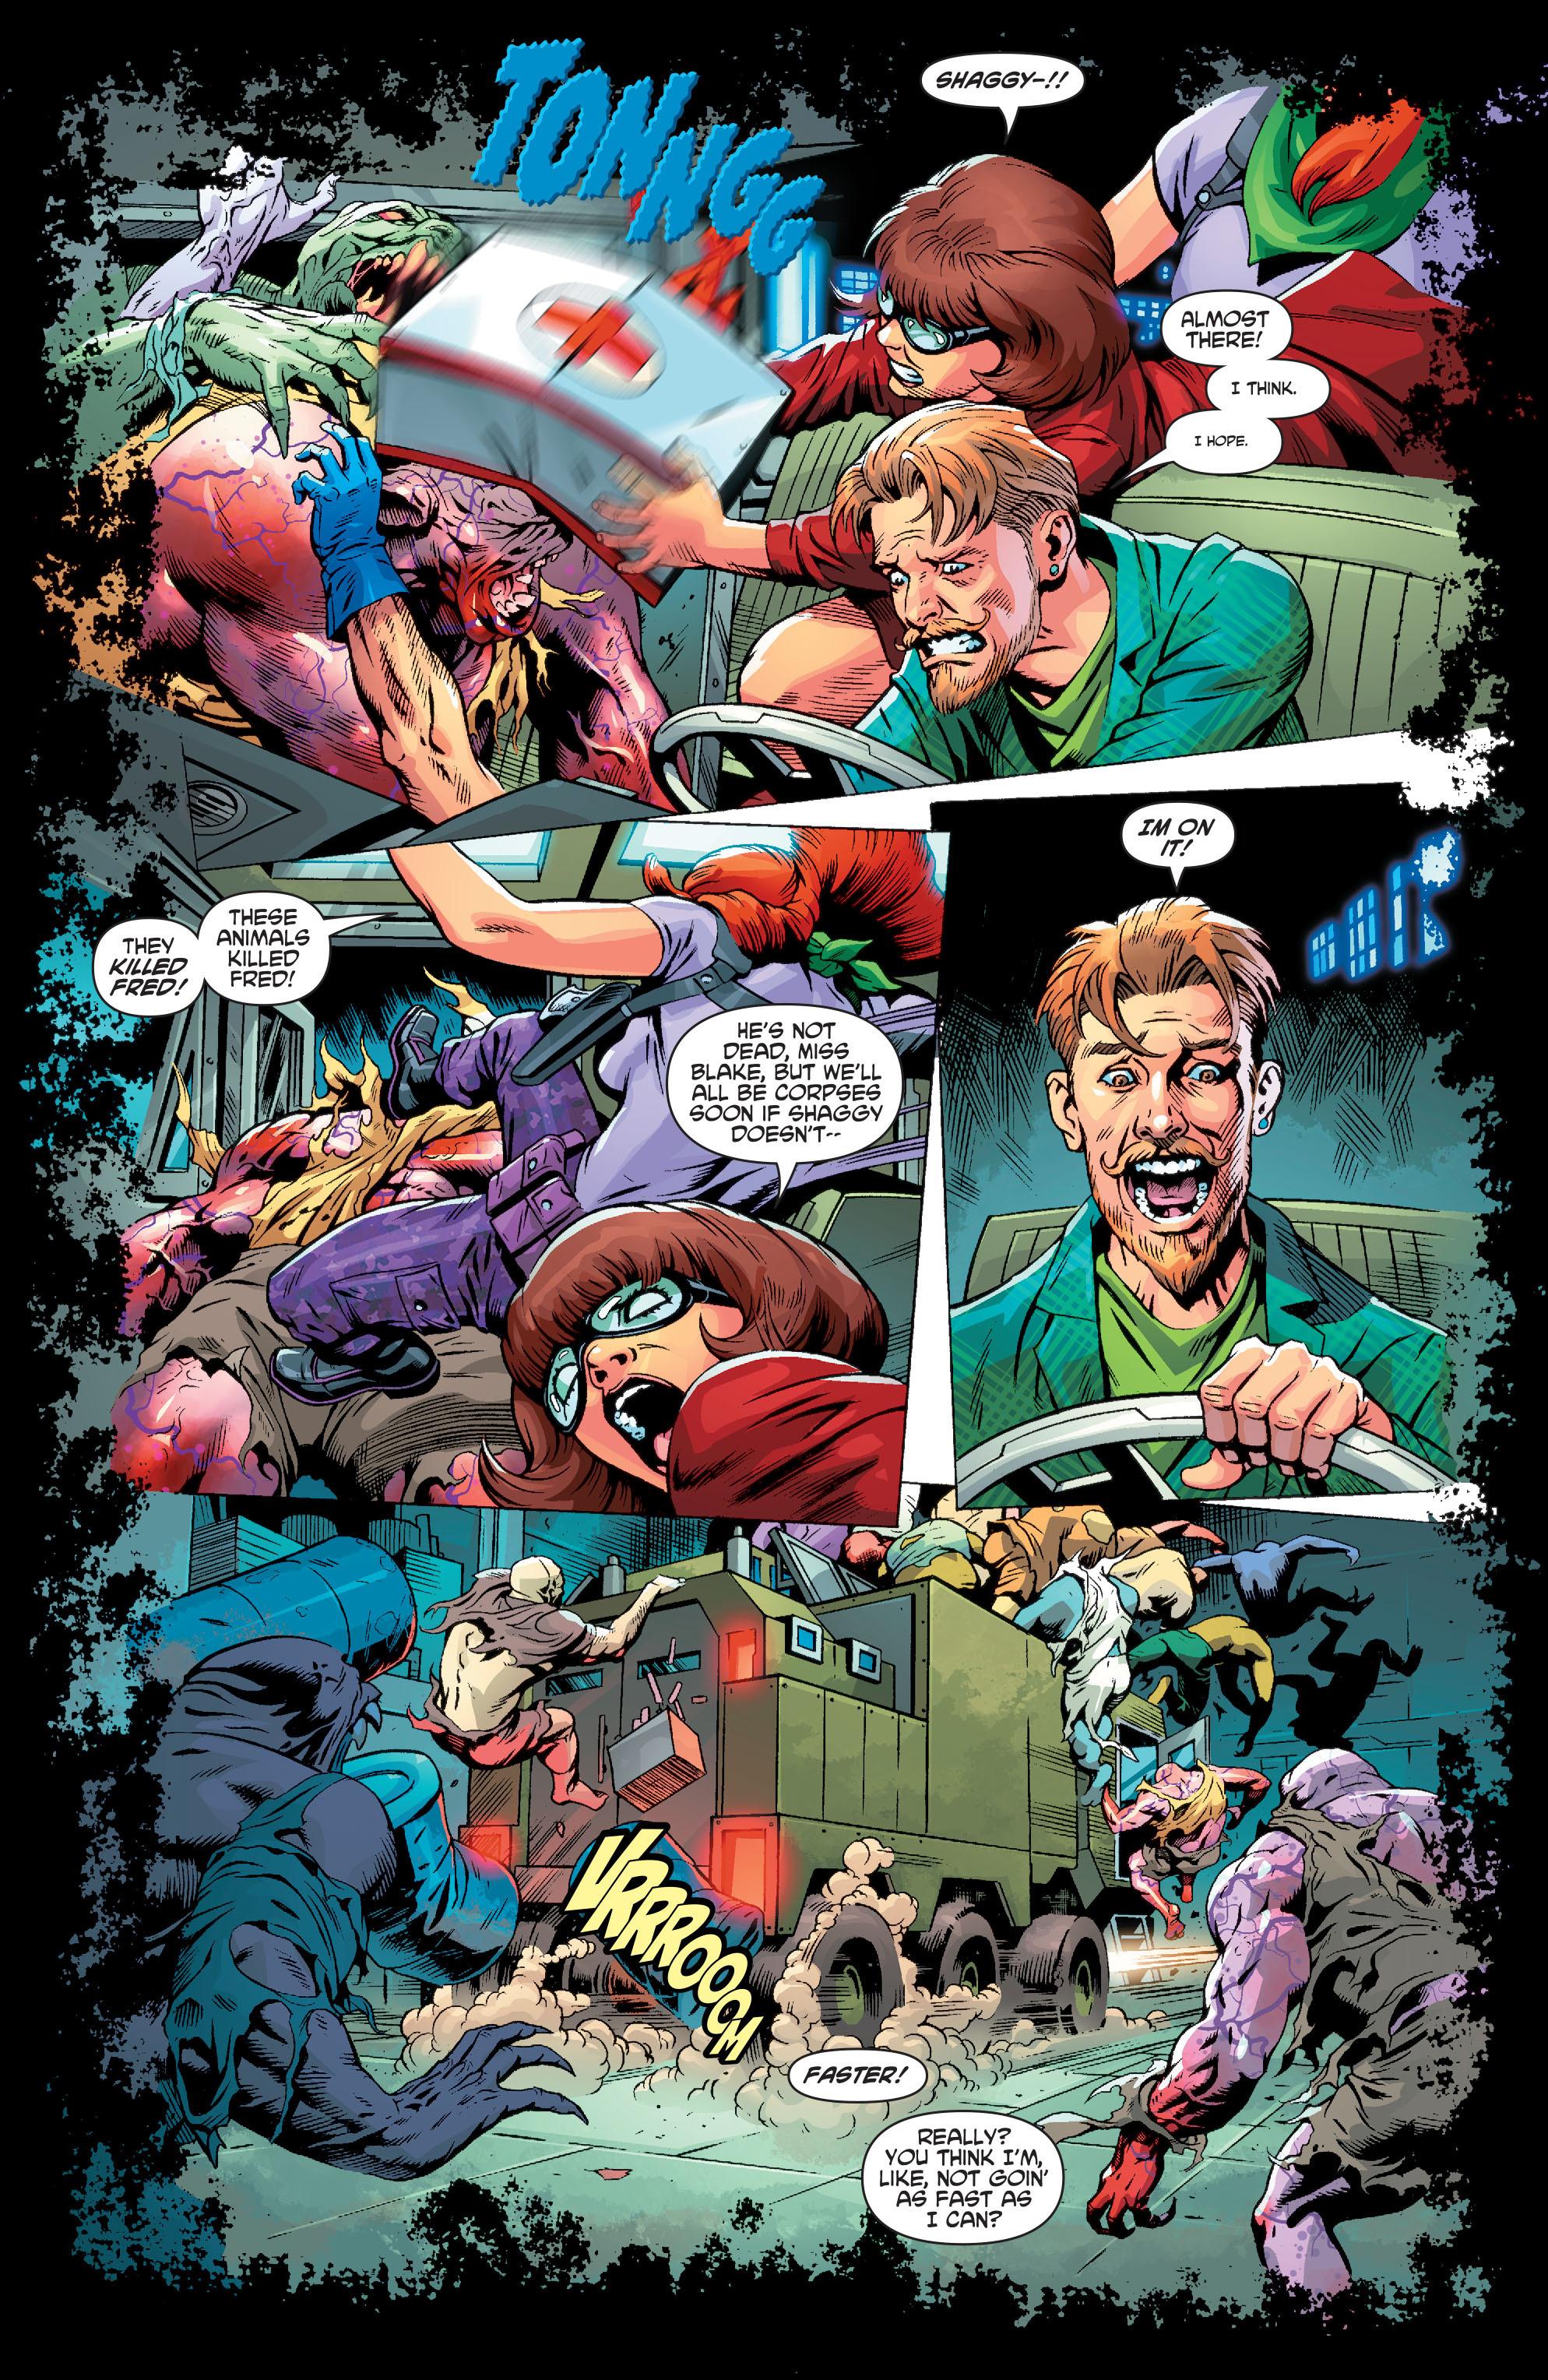 Read online Scooby Apocalypse comic -  Issue #3 - 17